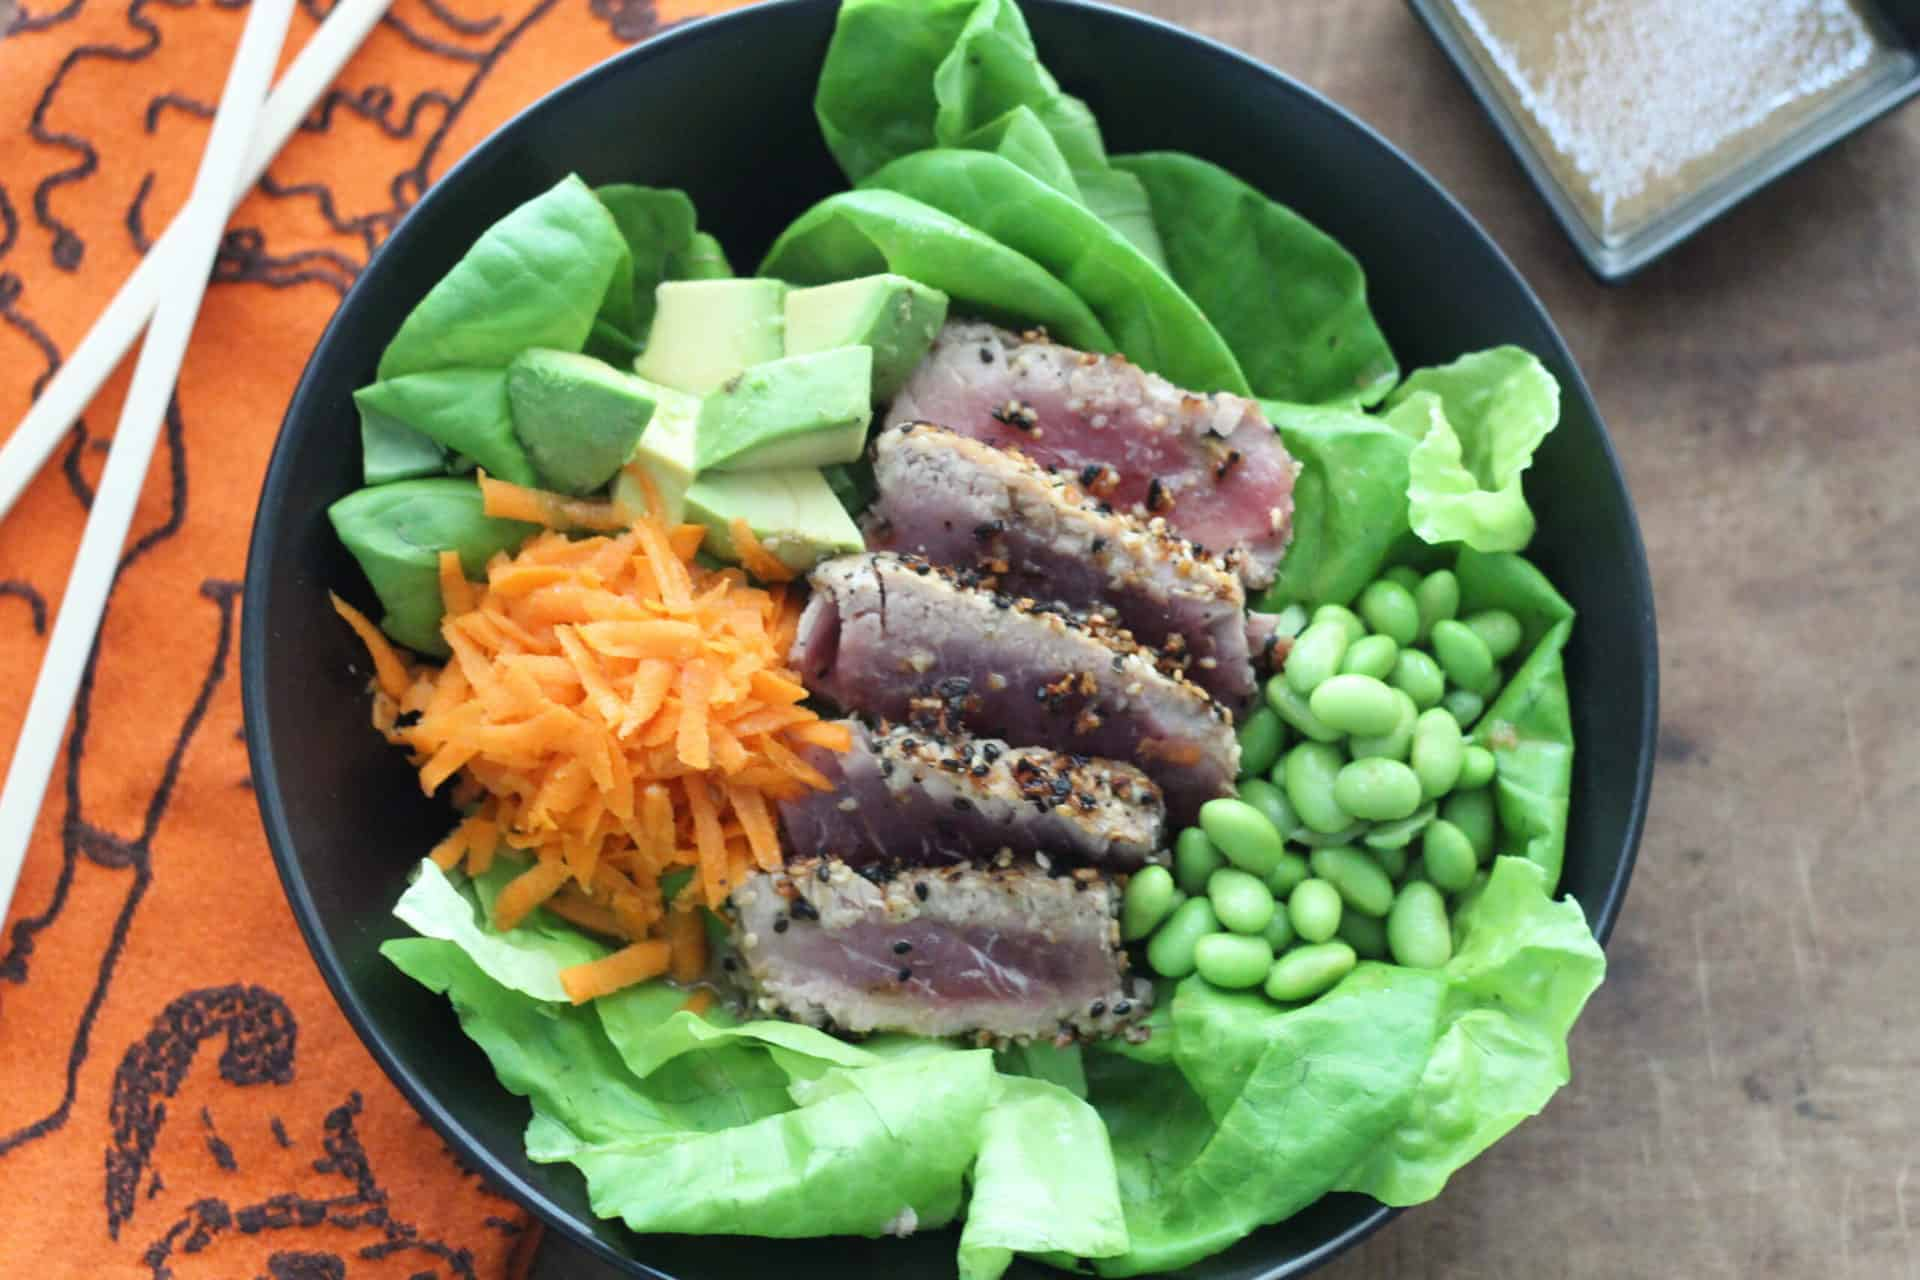 Tuna, Seafood, Fish, Bowls, Salads, Dinner, Lunch